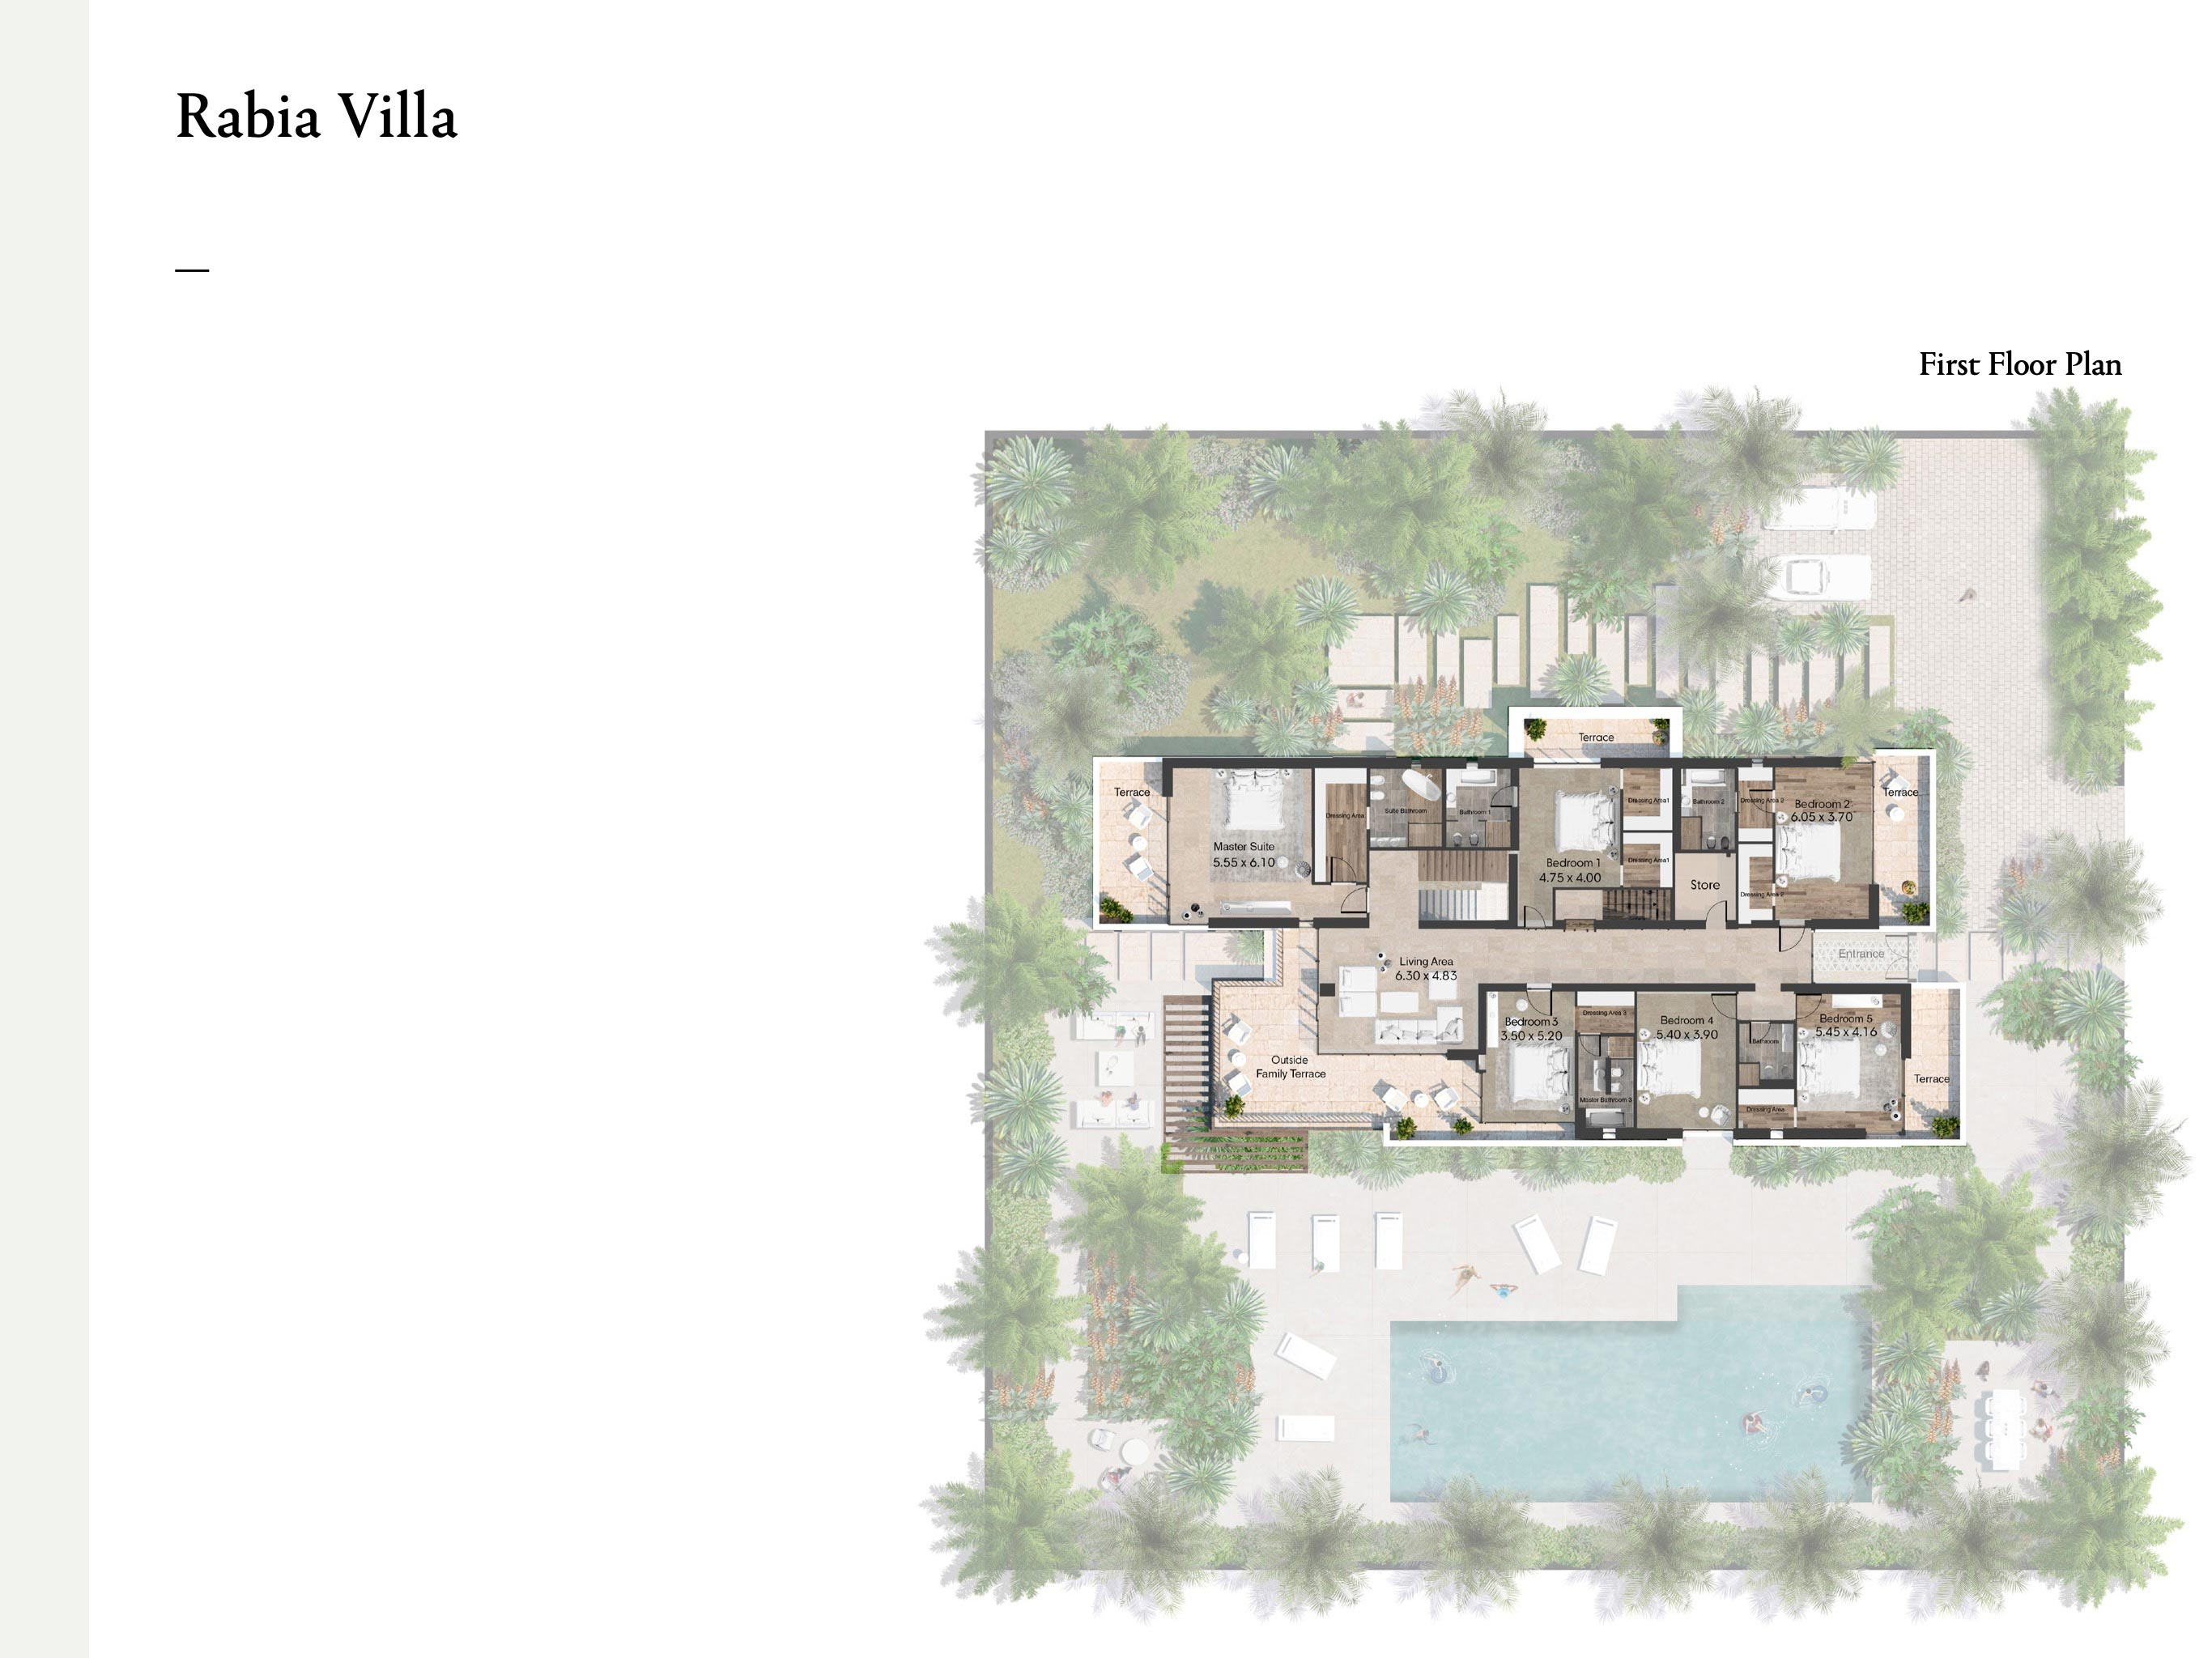 سبع غرف نوم مع الحجم 1126 متر مربع